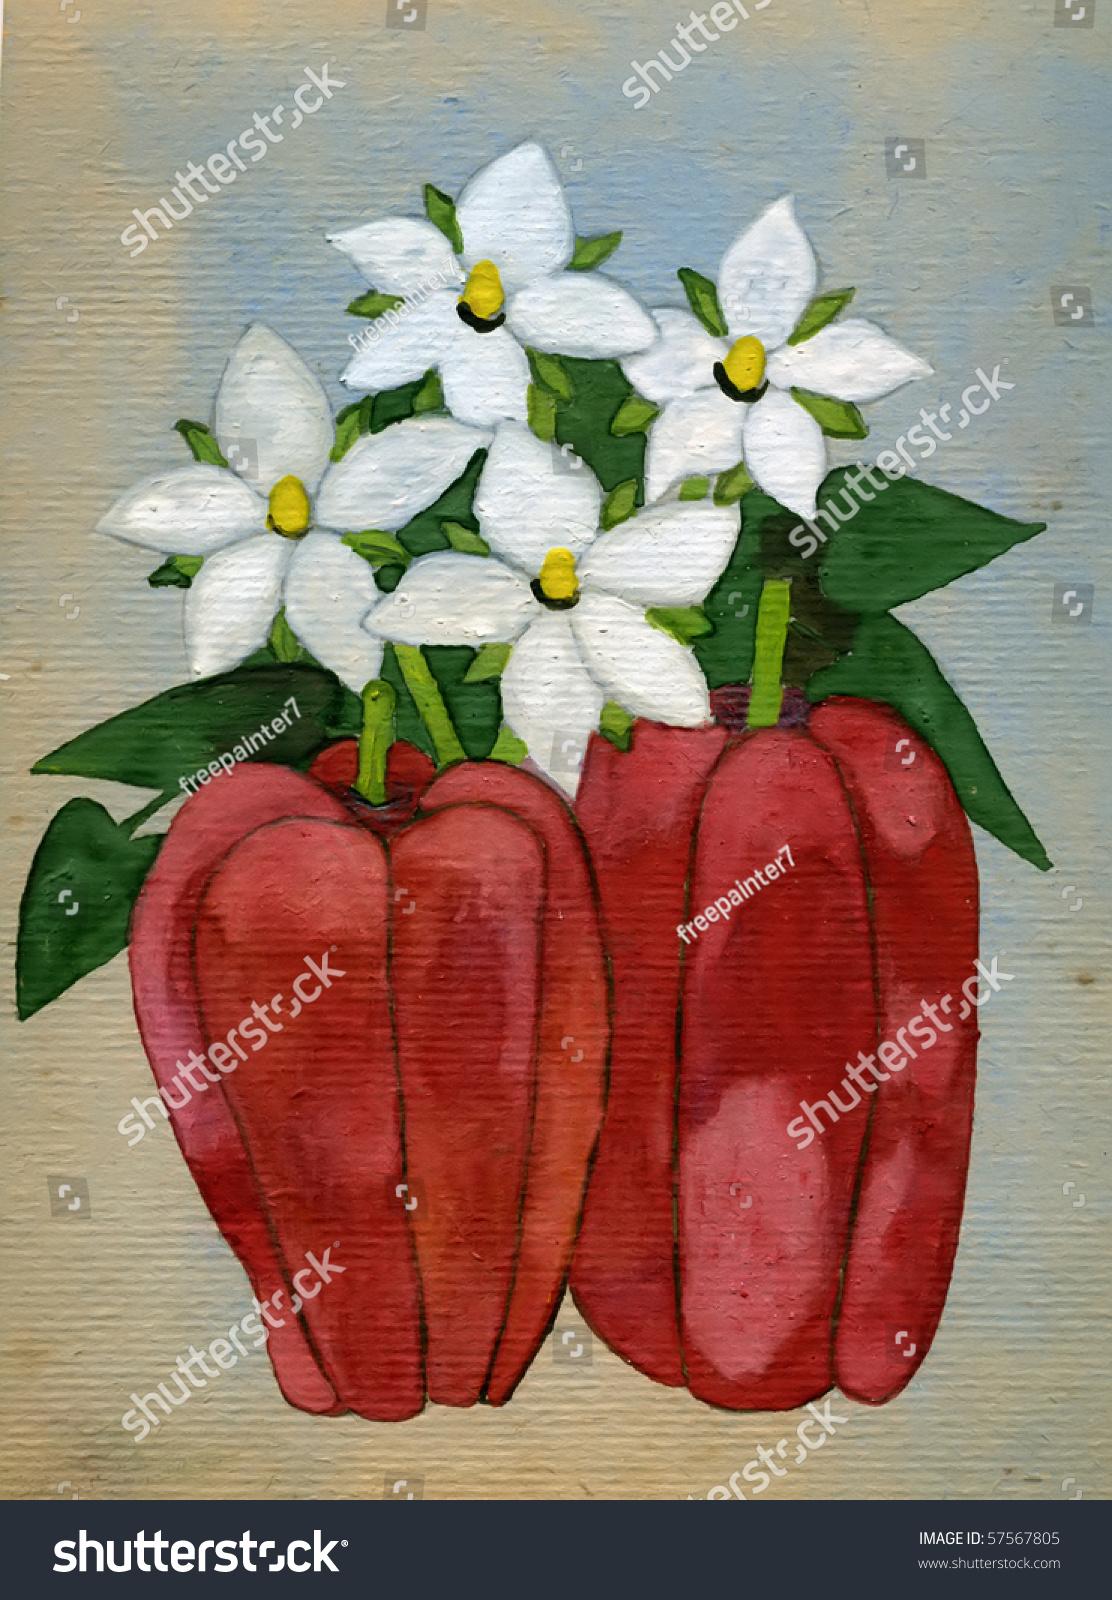 White Flowers Red Peppers Gouache On Stock Illustration 57567805